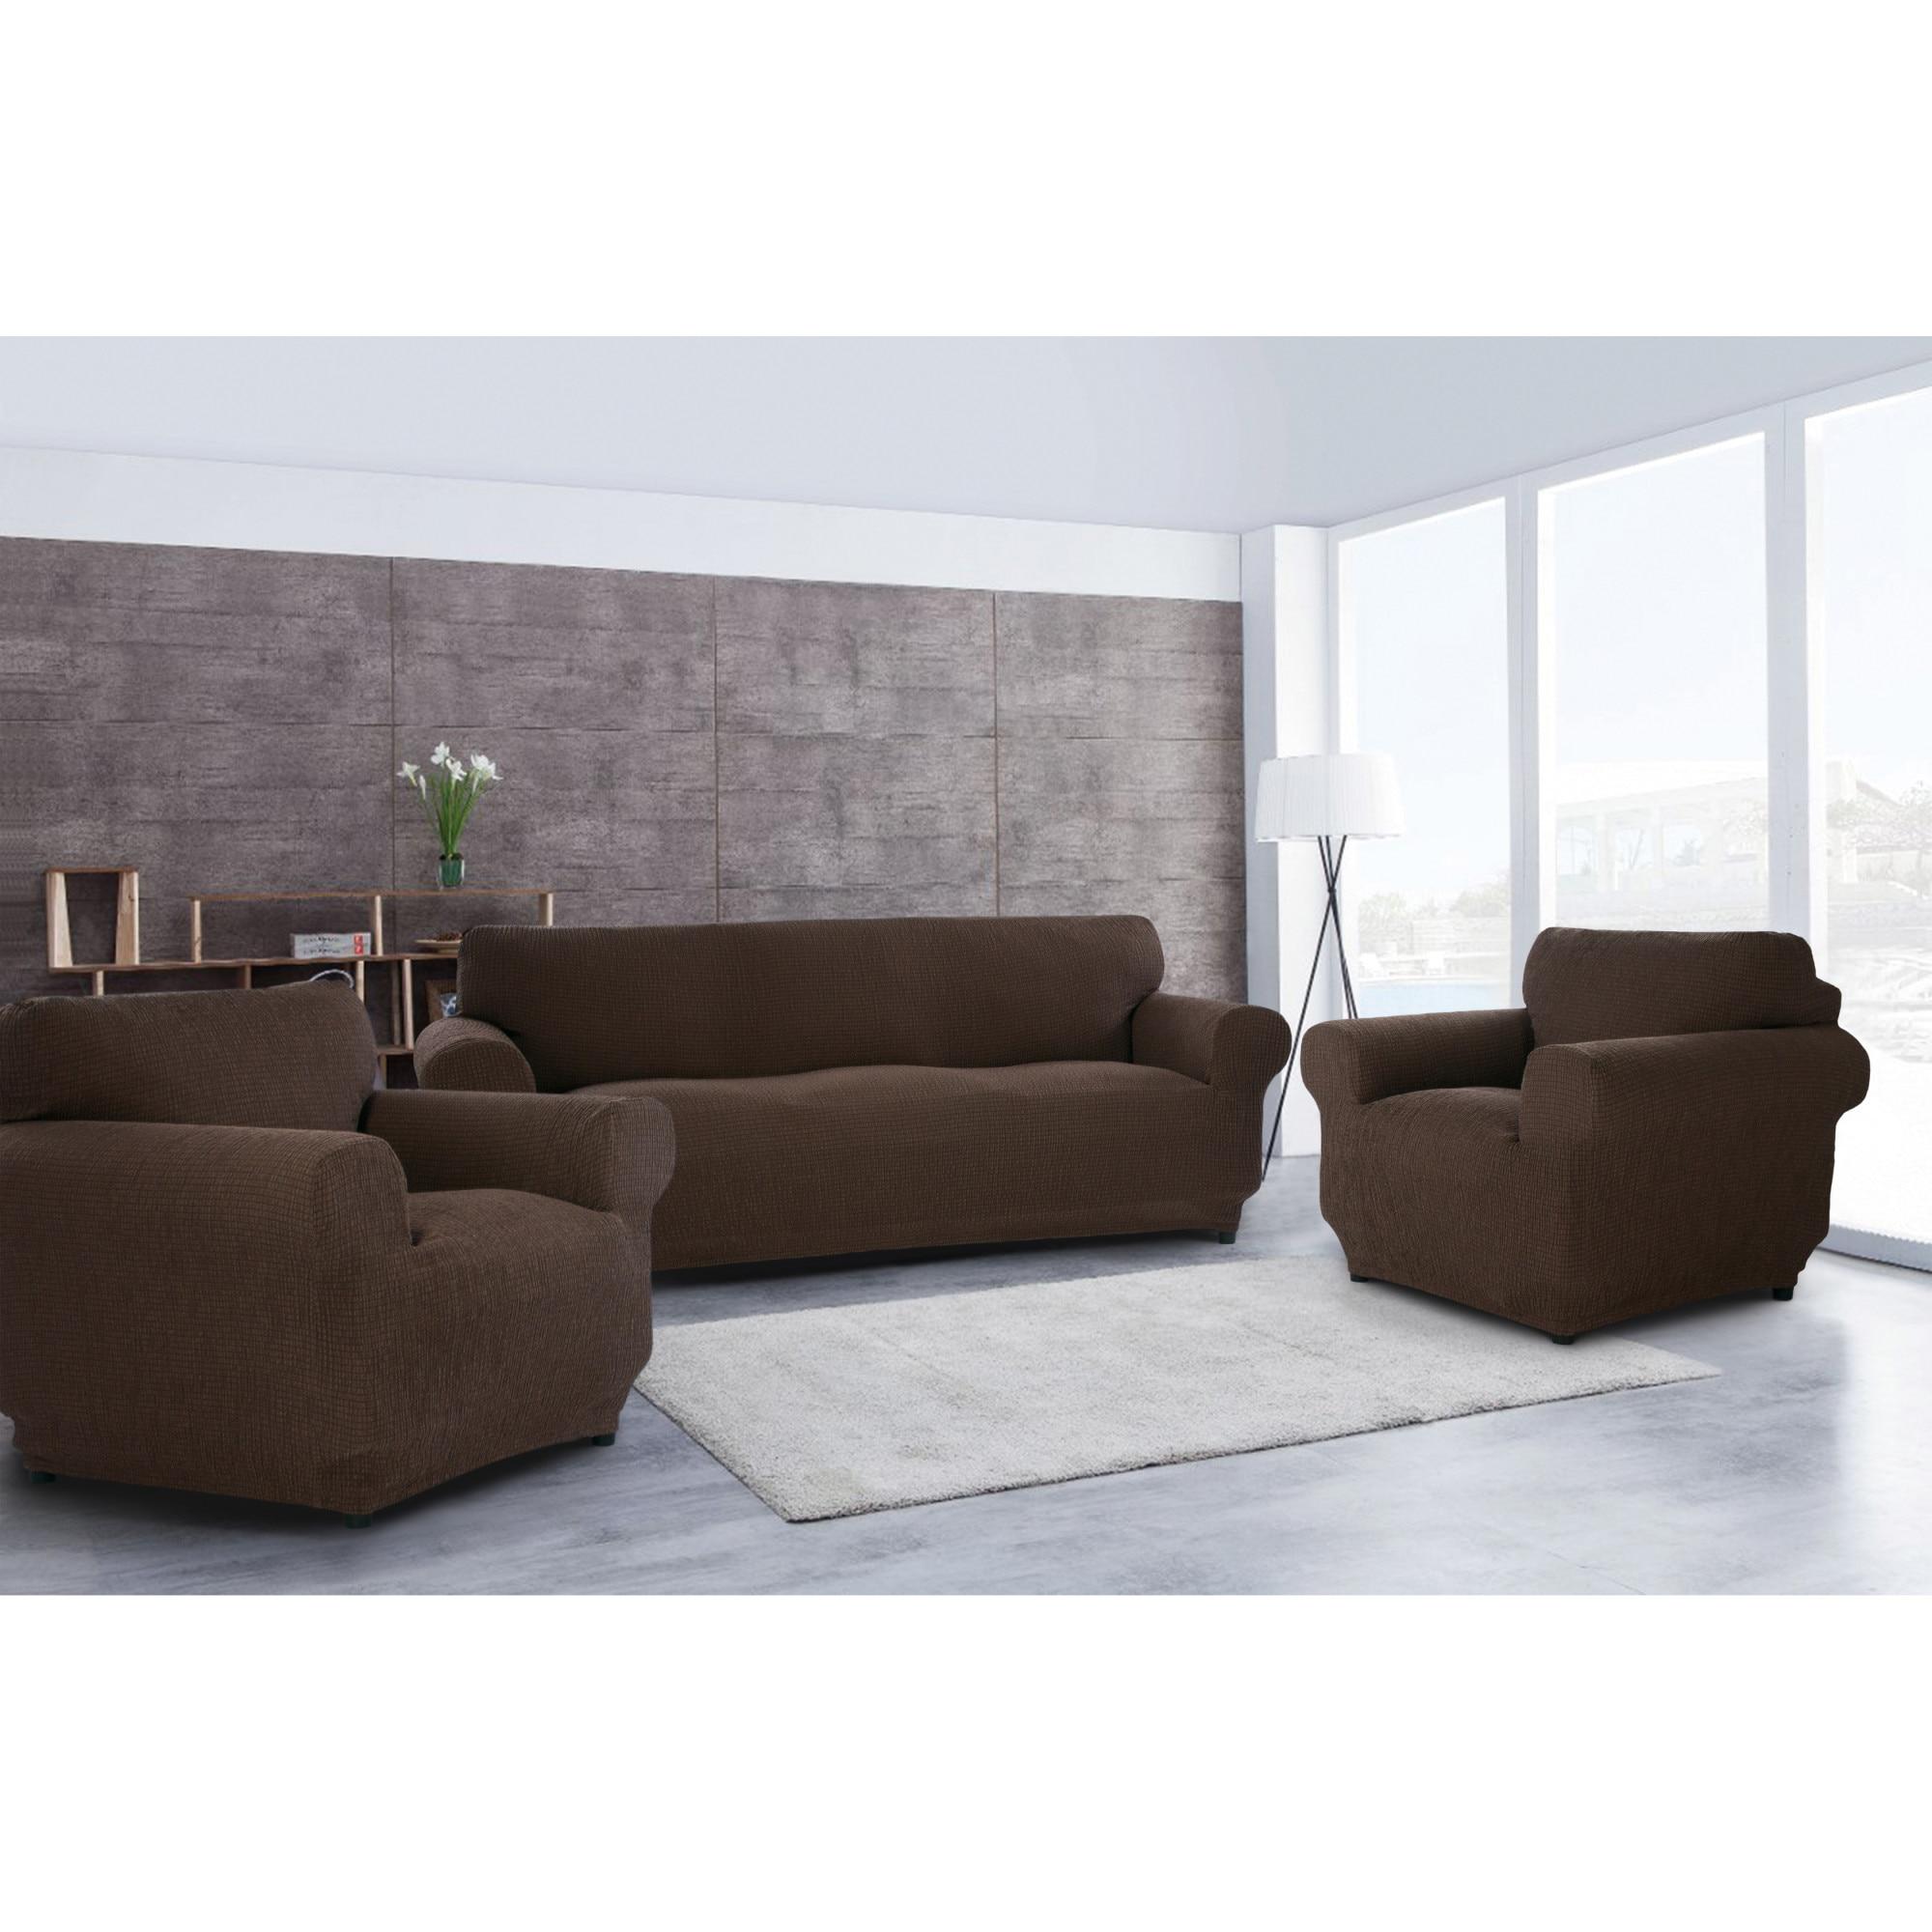 Fotografie Set huse elastice pentru canapea 3 locuri si 2 fotolii Kring Nairobi, 60% bumbac+ 35% poliester + 5% elastan, Cappuccino